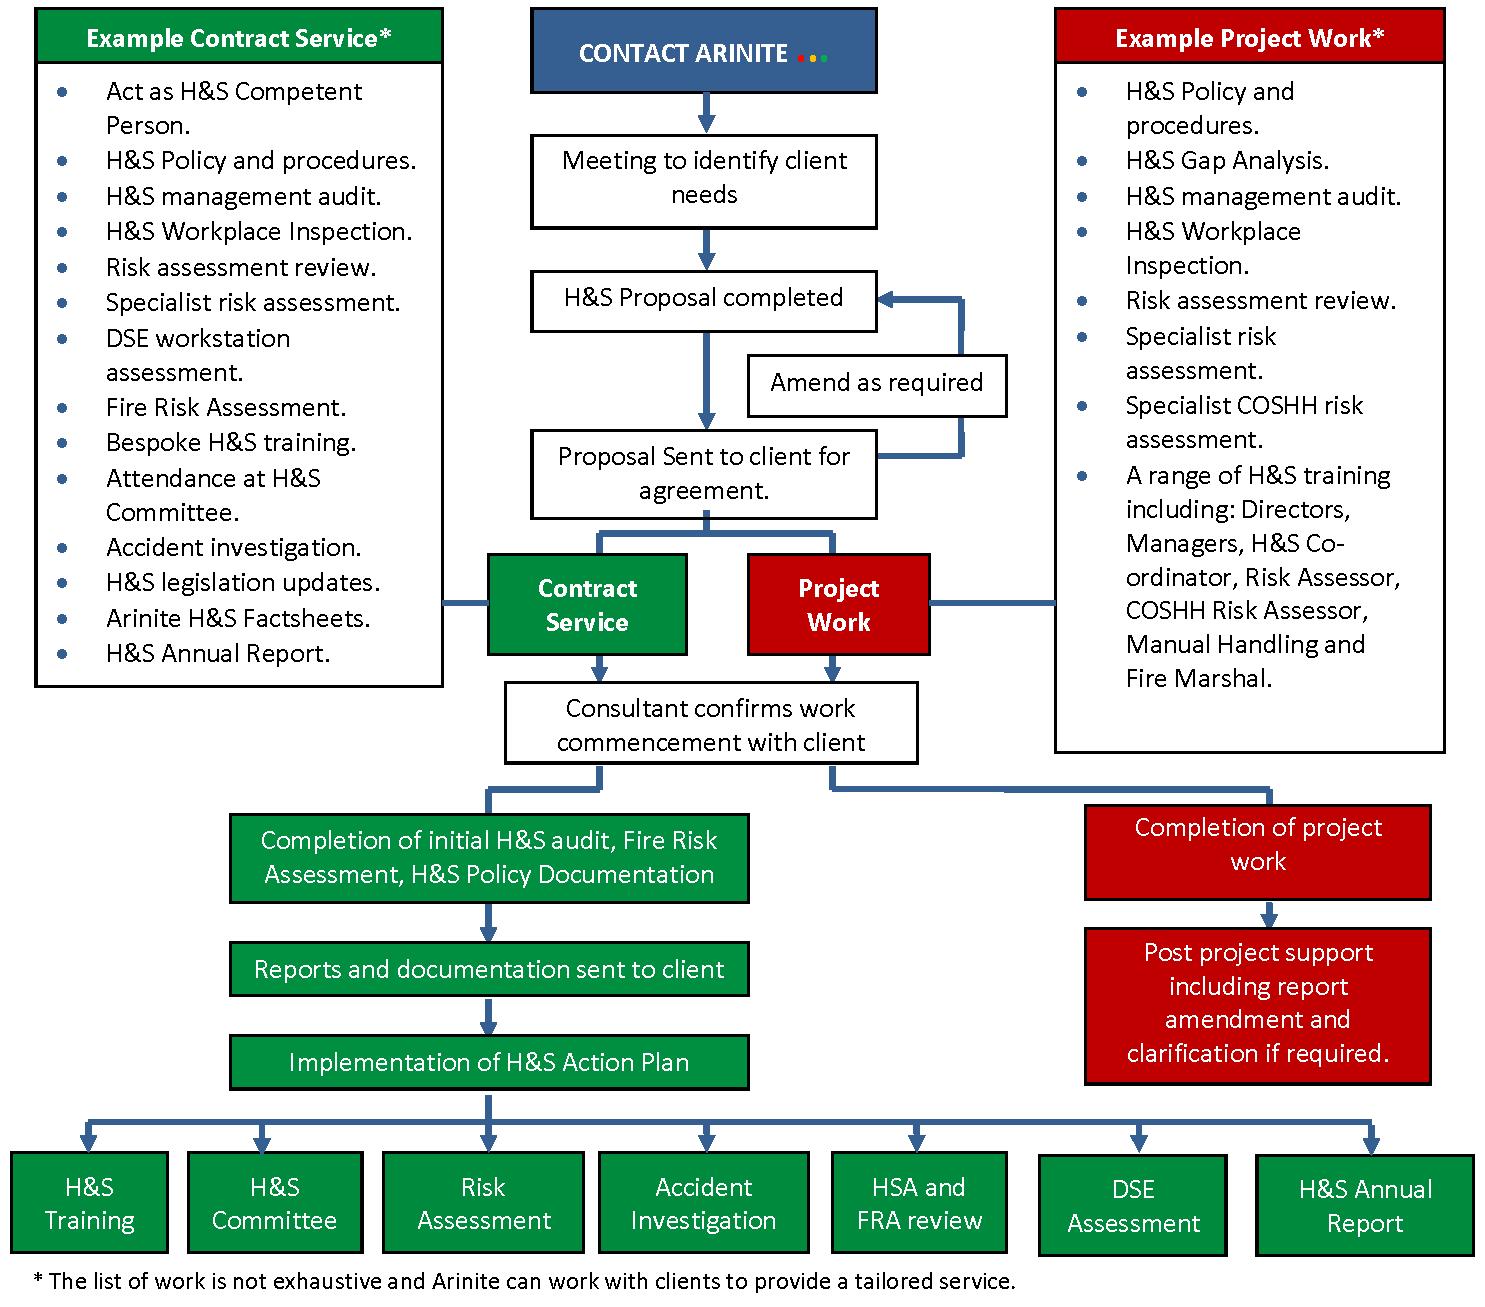 arinite service summary